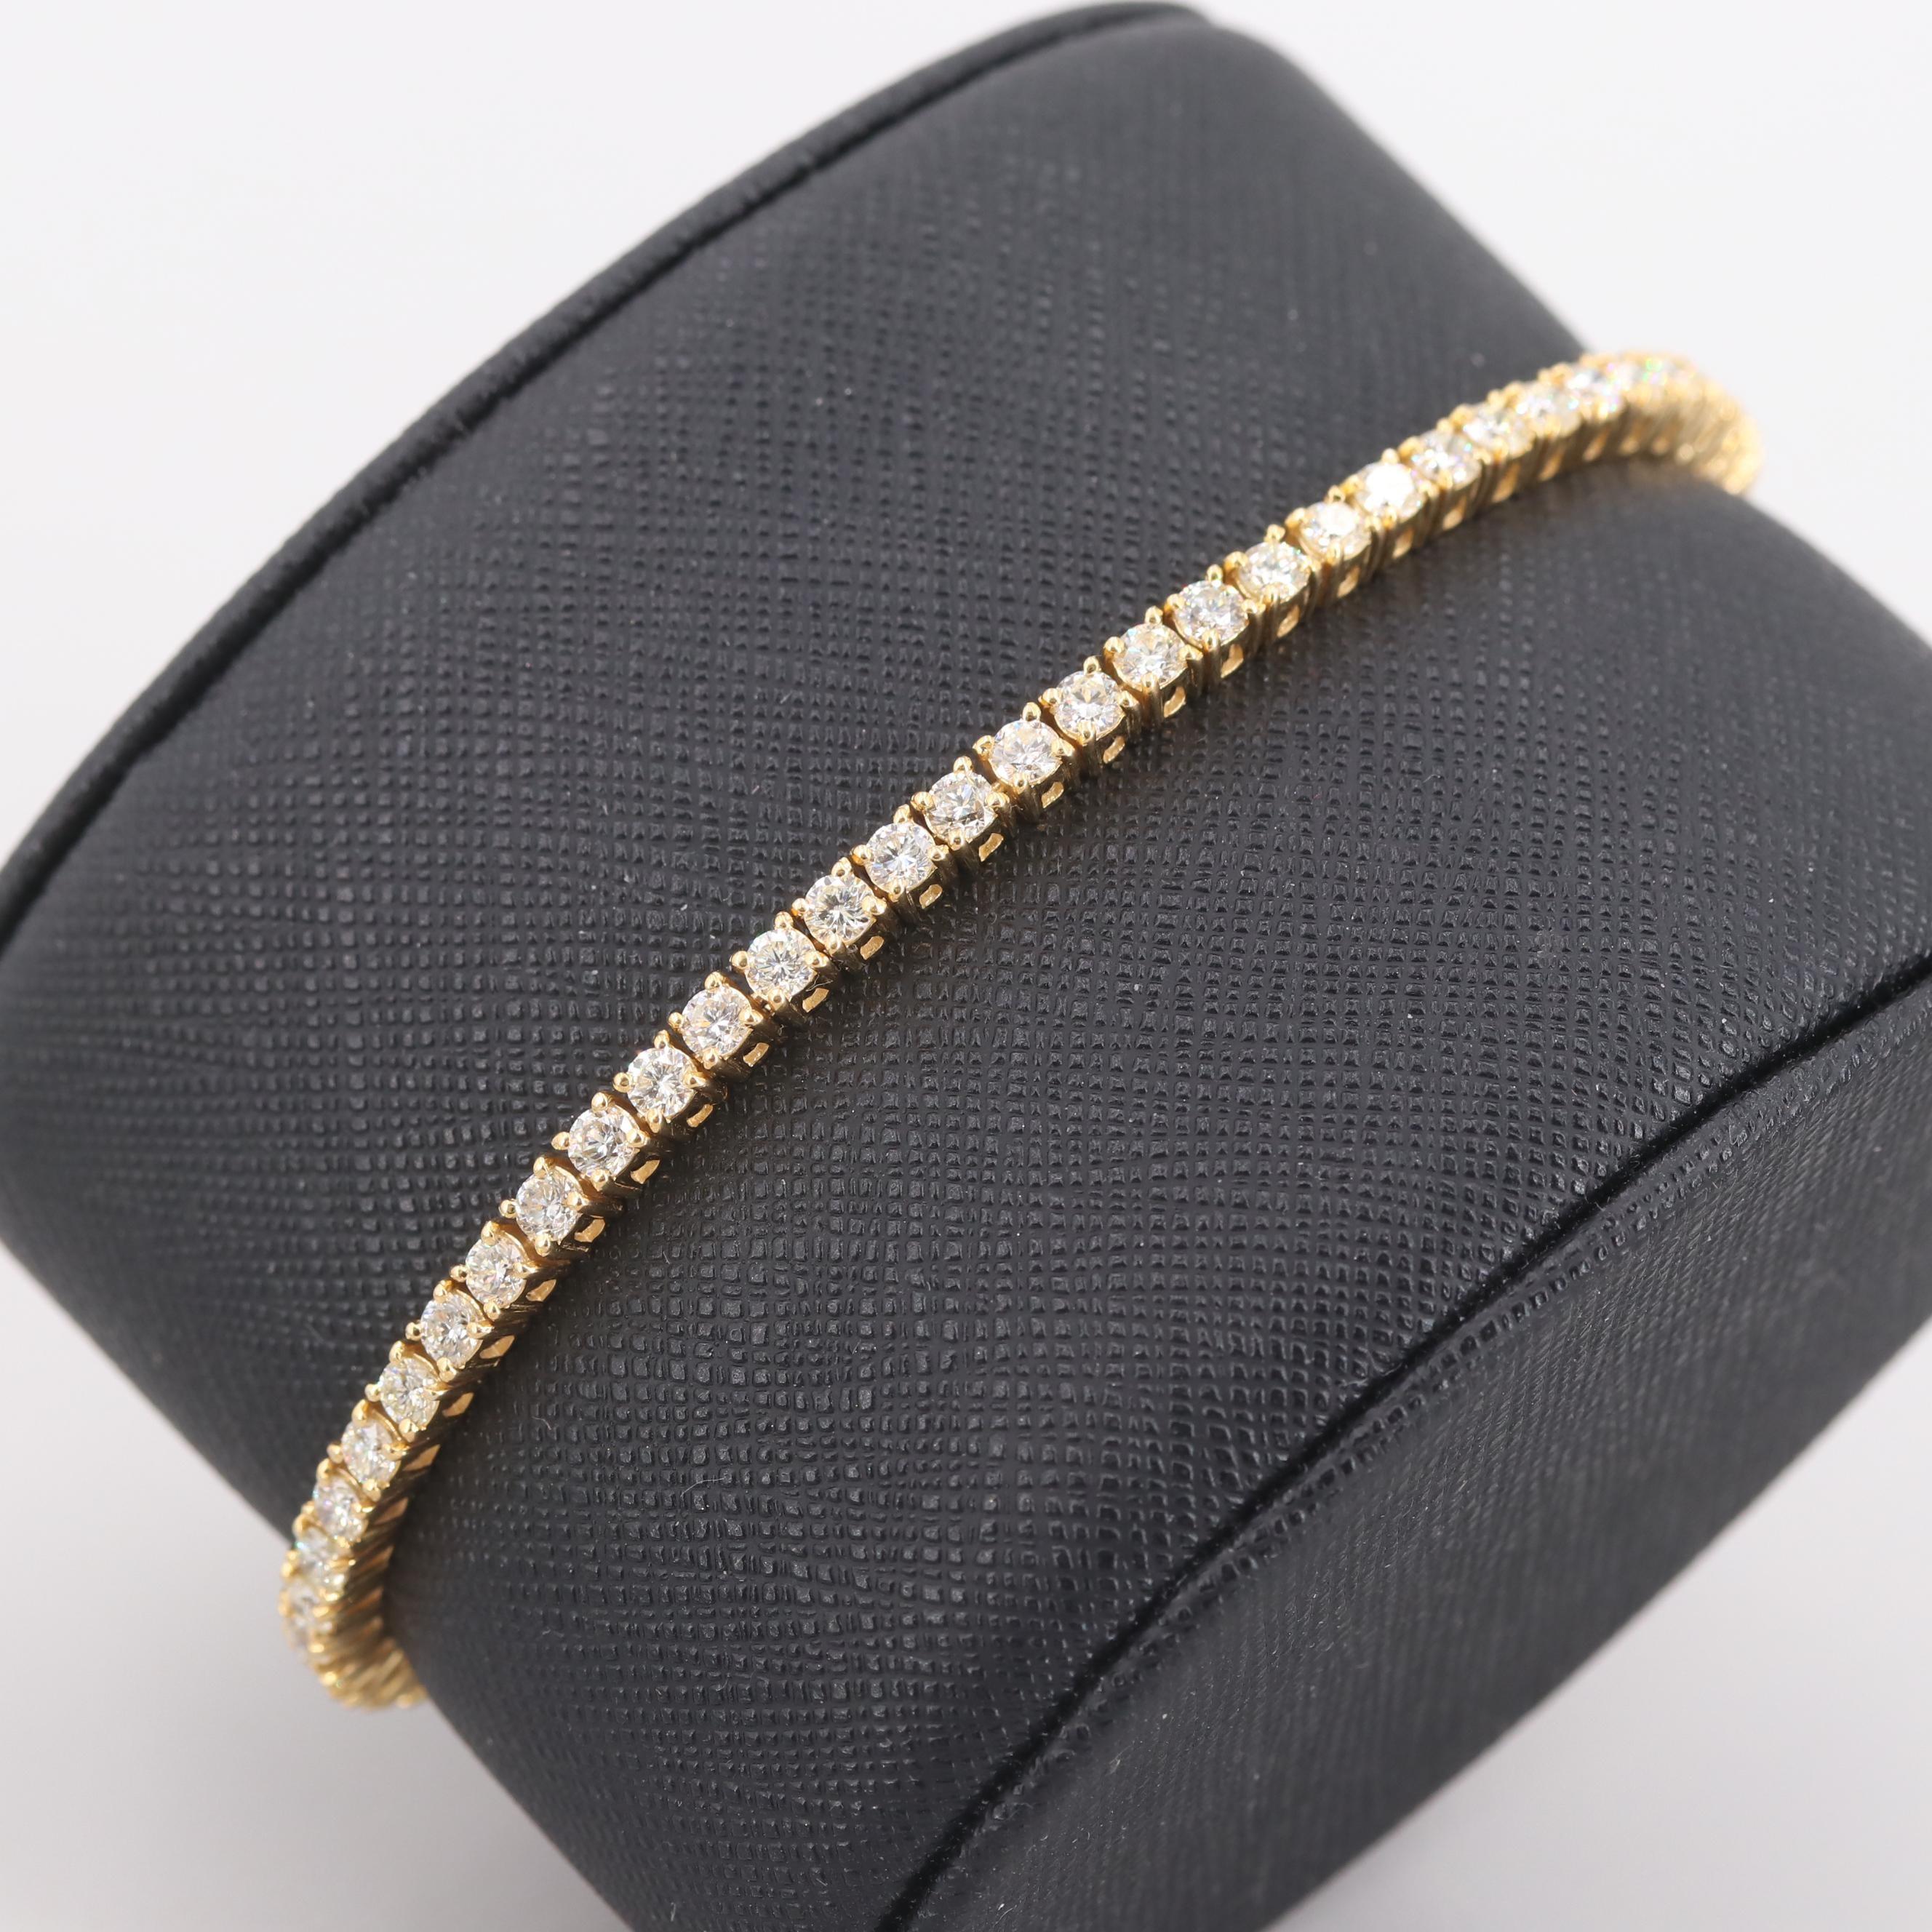 18K Yellow Gold 4.40 CTW Diamond Tennis Bracelet